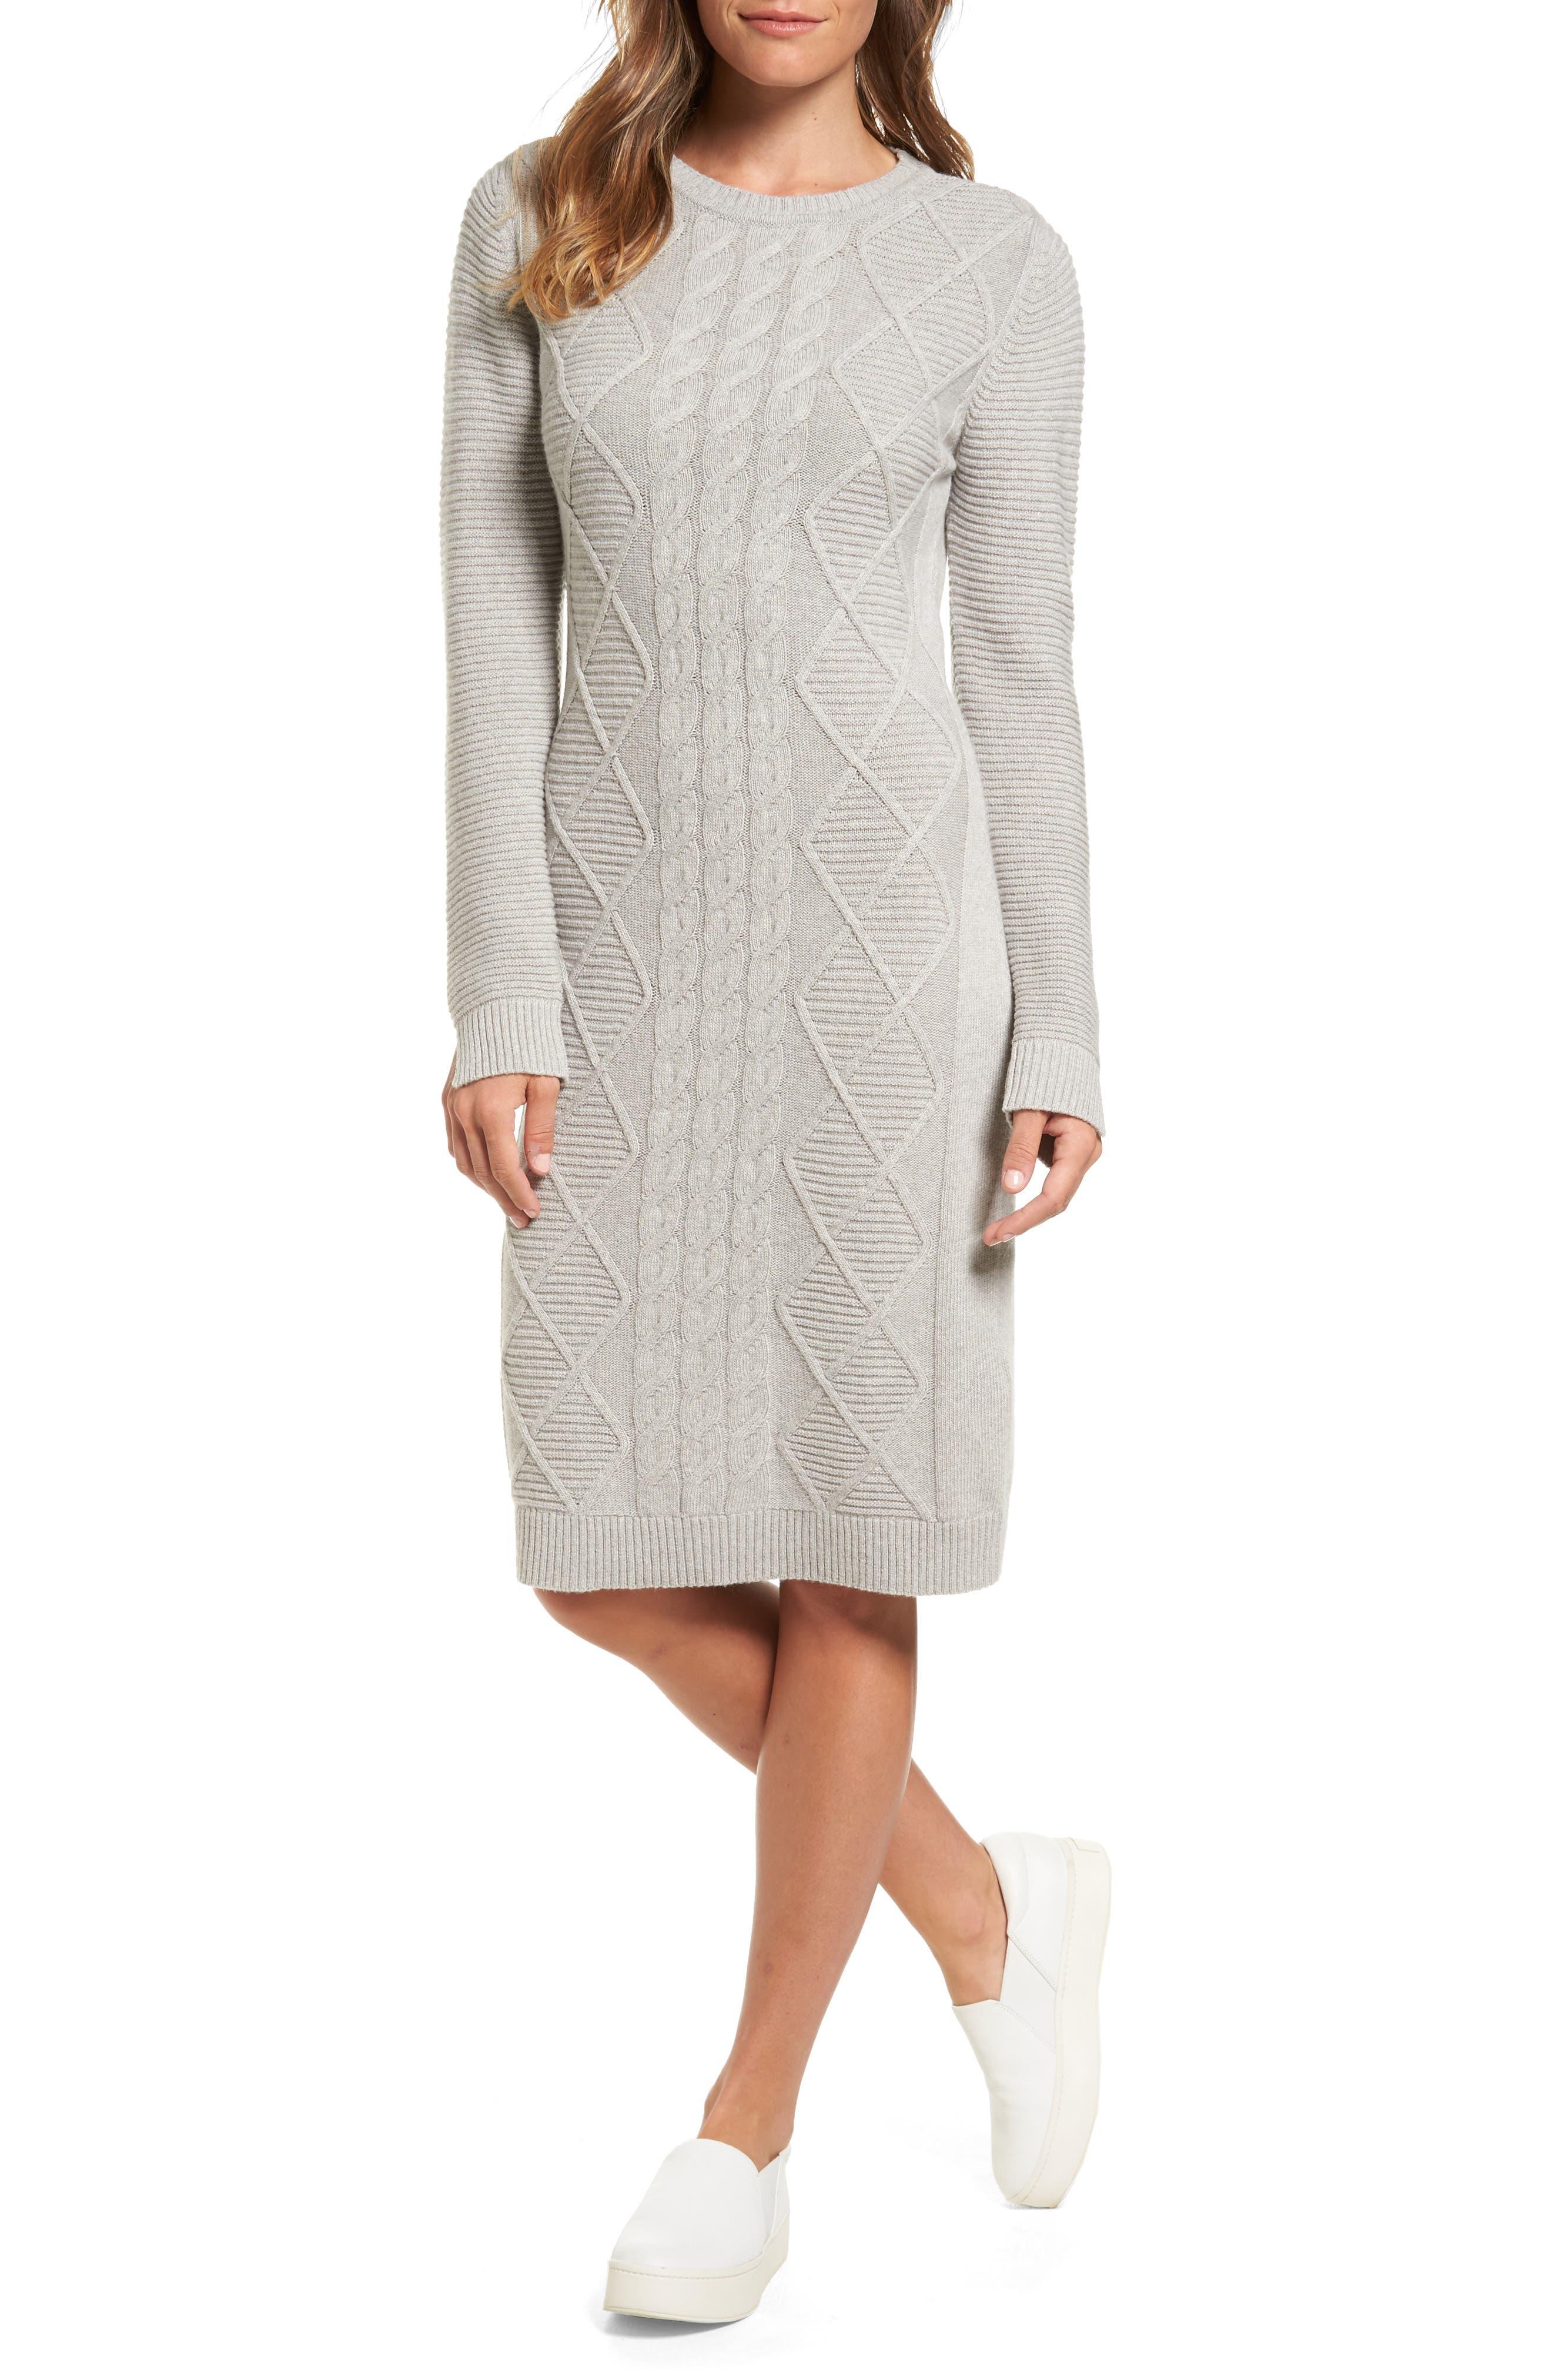 Emmanuel Cable Knit Sweater Dress,                         Main,                         color, 050